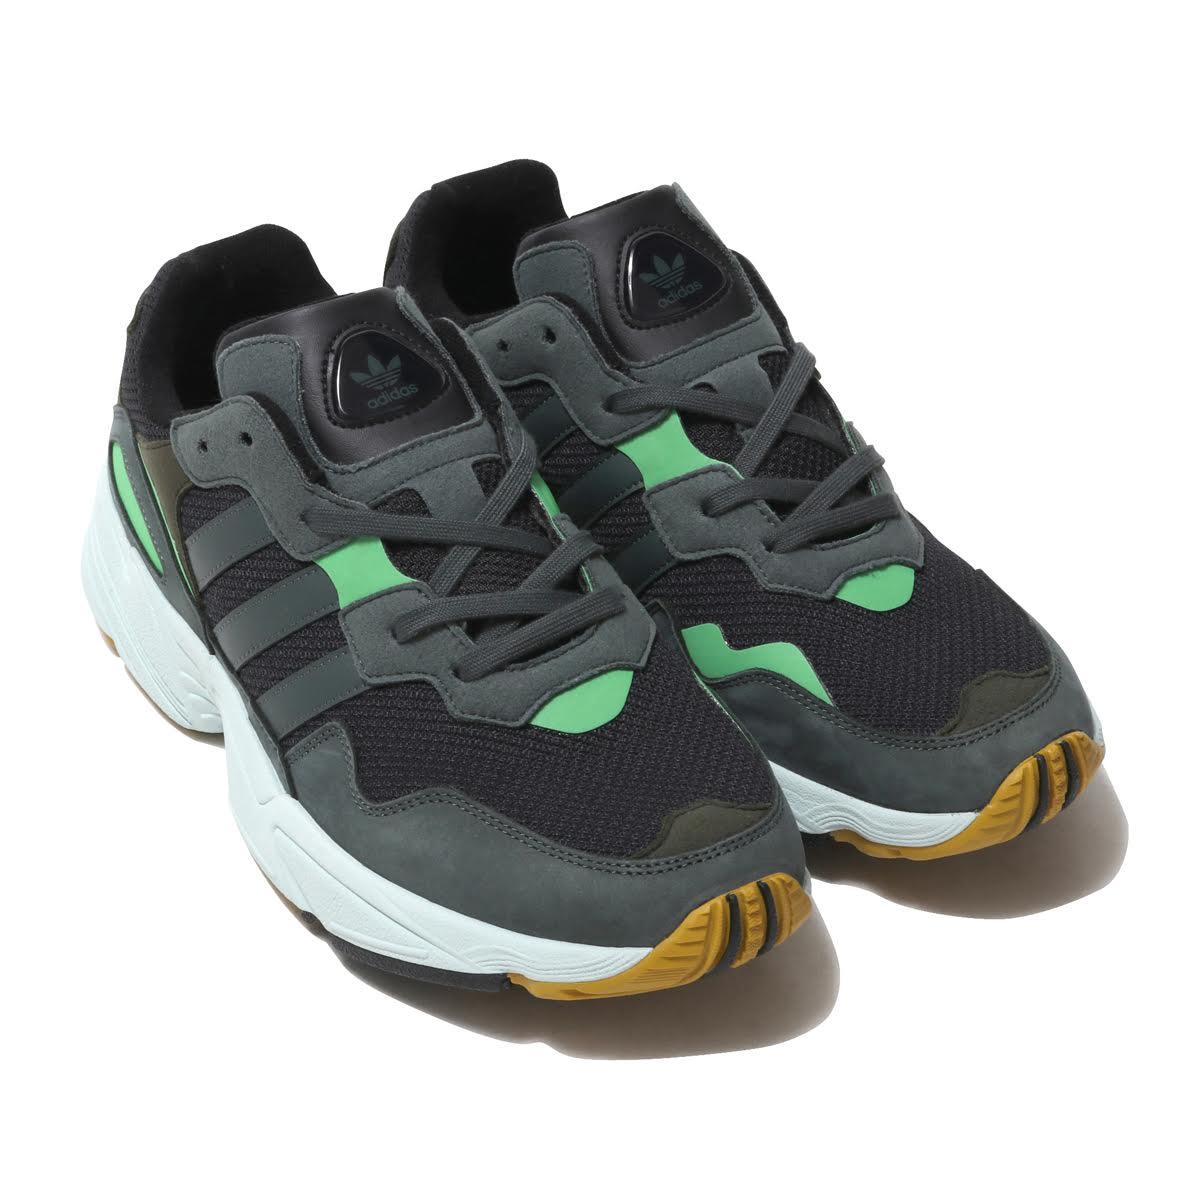 adidas Originals YUNG-96(アディダスオリジナルス ヤング-96)(CORE BLACK/LEGEND IVY/RAW OCHRE)【メンズ スニーカー】19SS-I